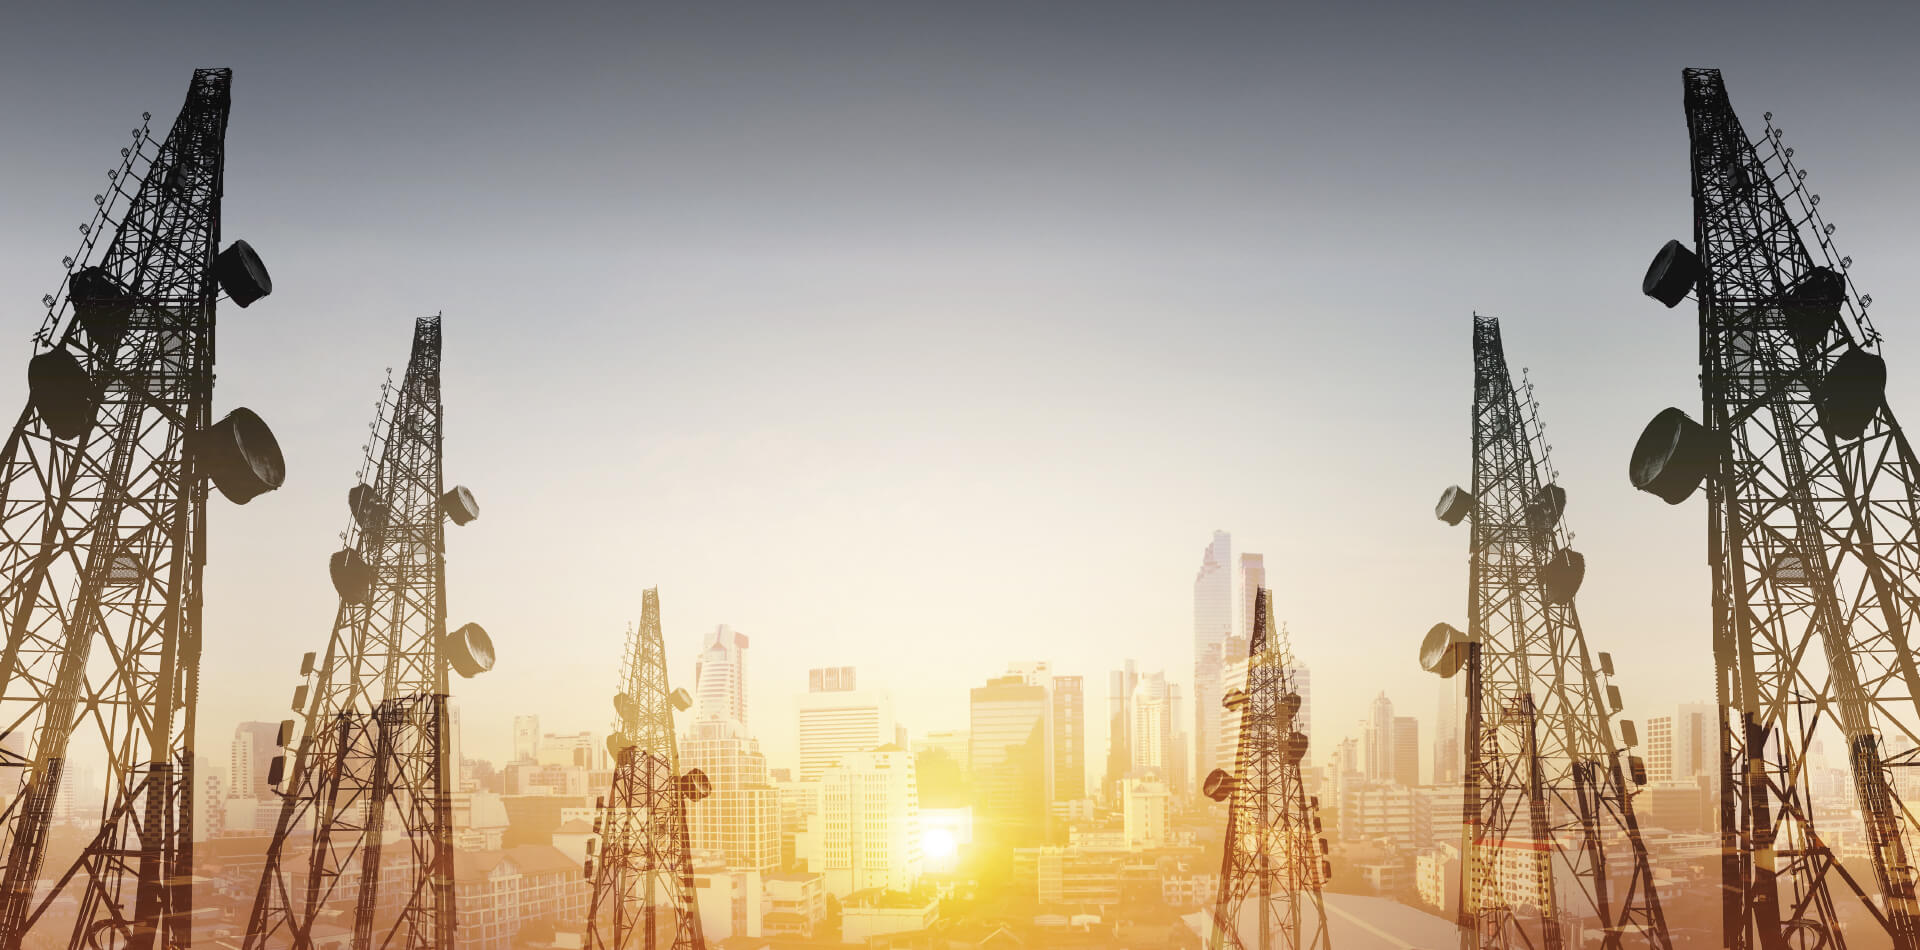 Telecommunication towers background